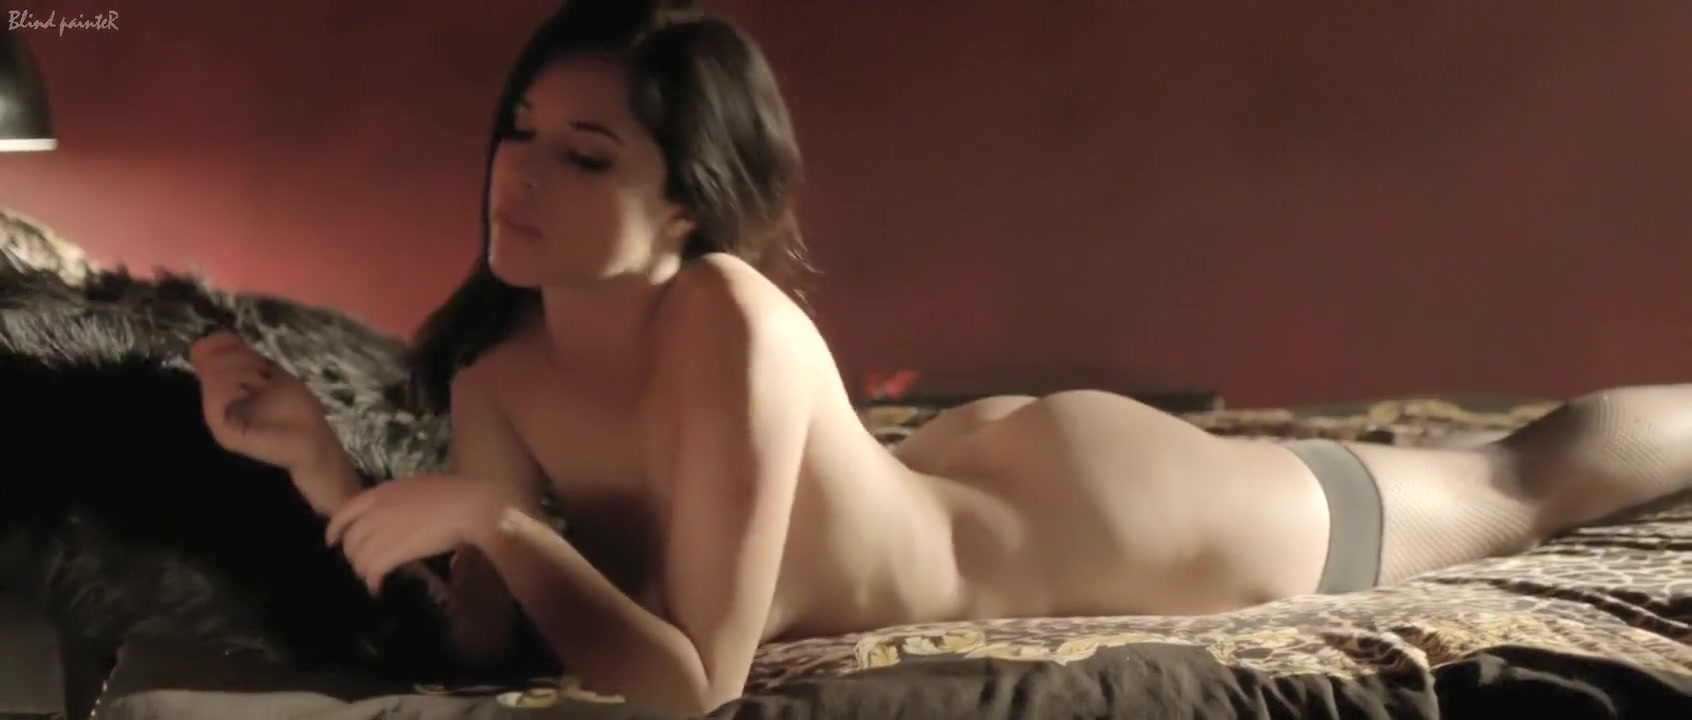 wwe sexy super fan xXx Images